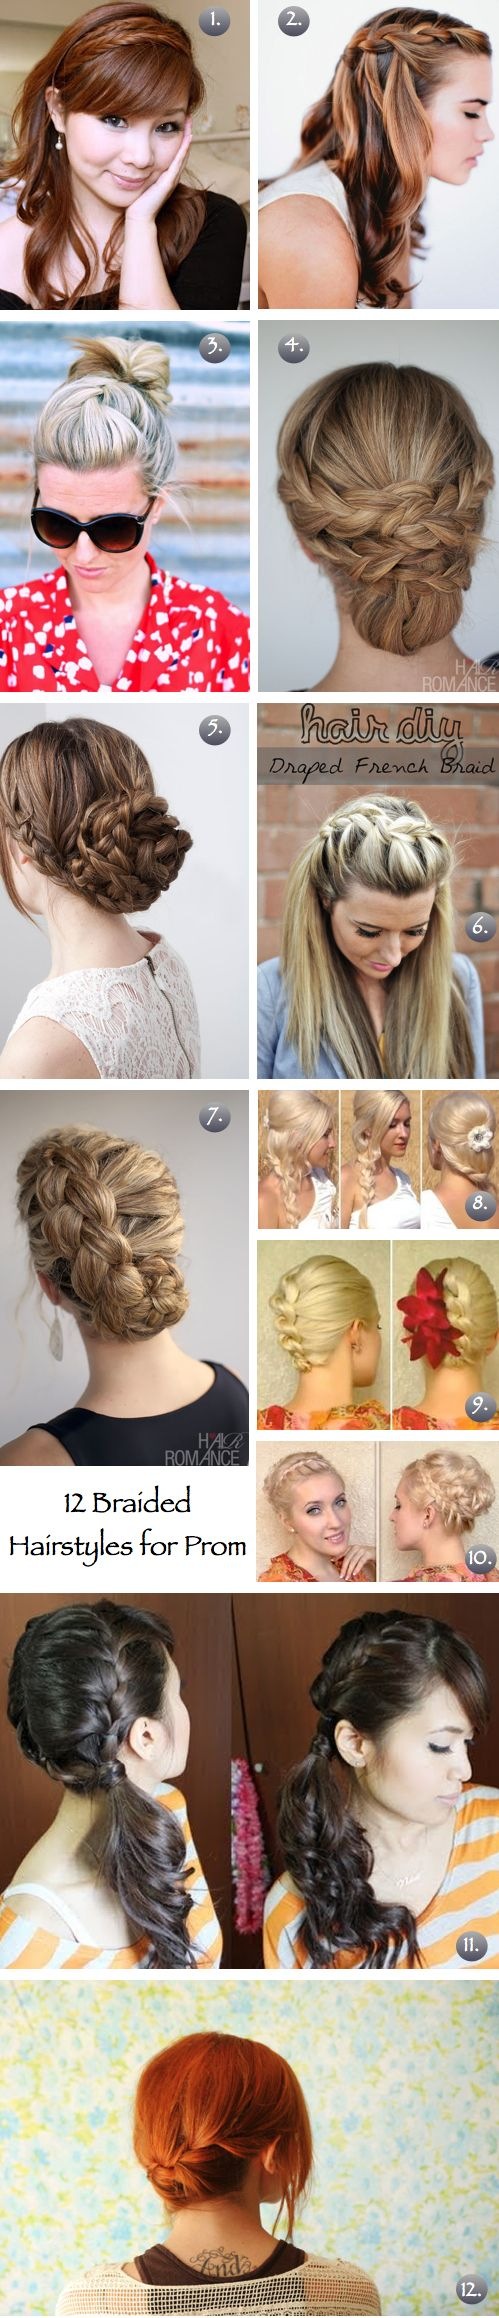 12 Braided Prom Or Wedding Hairstyles